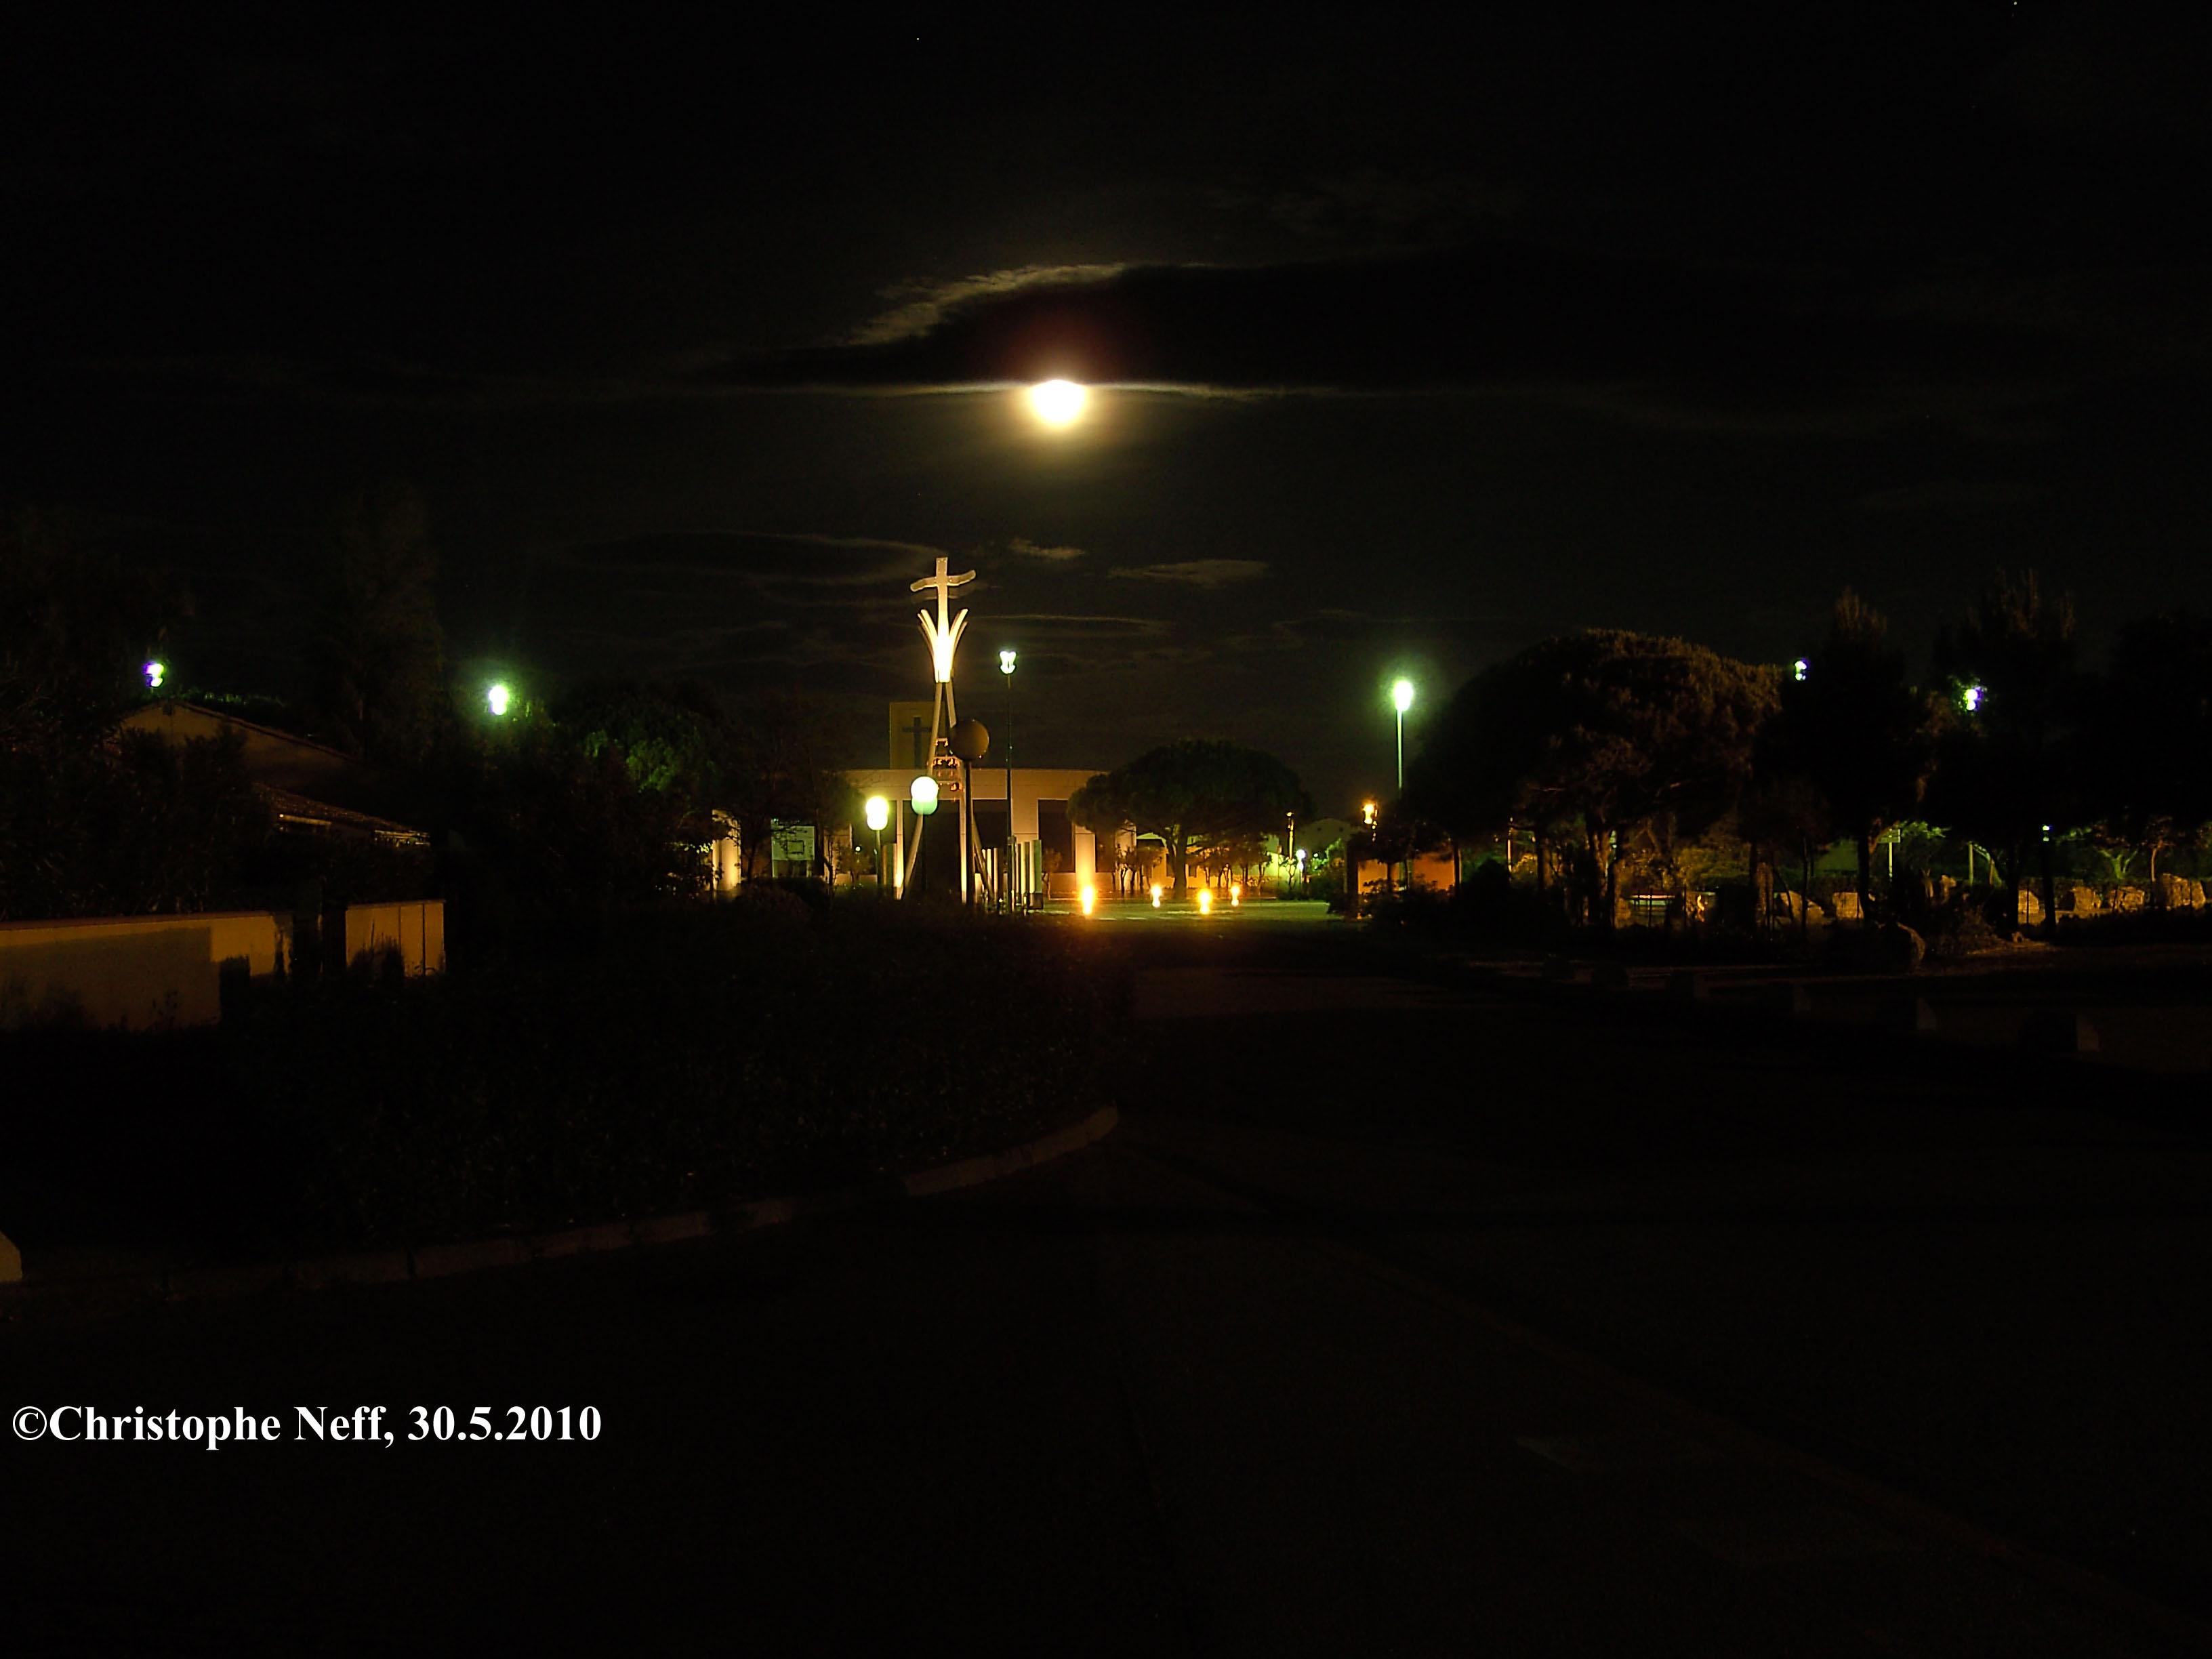 St. Jacques Port Leucate 29.5.2010 0H35